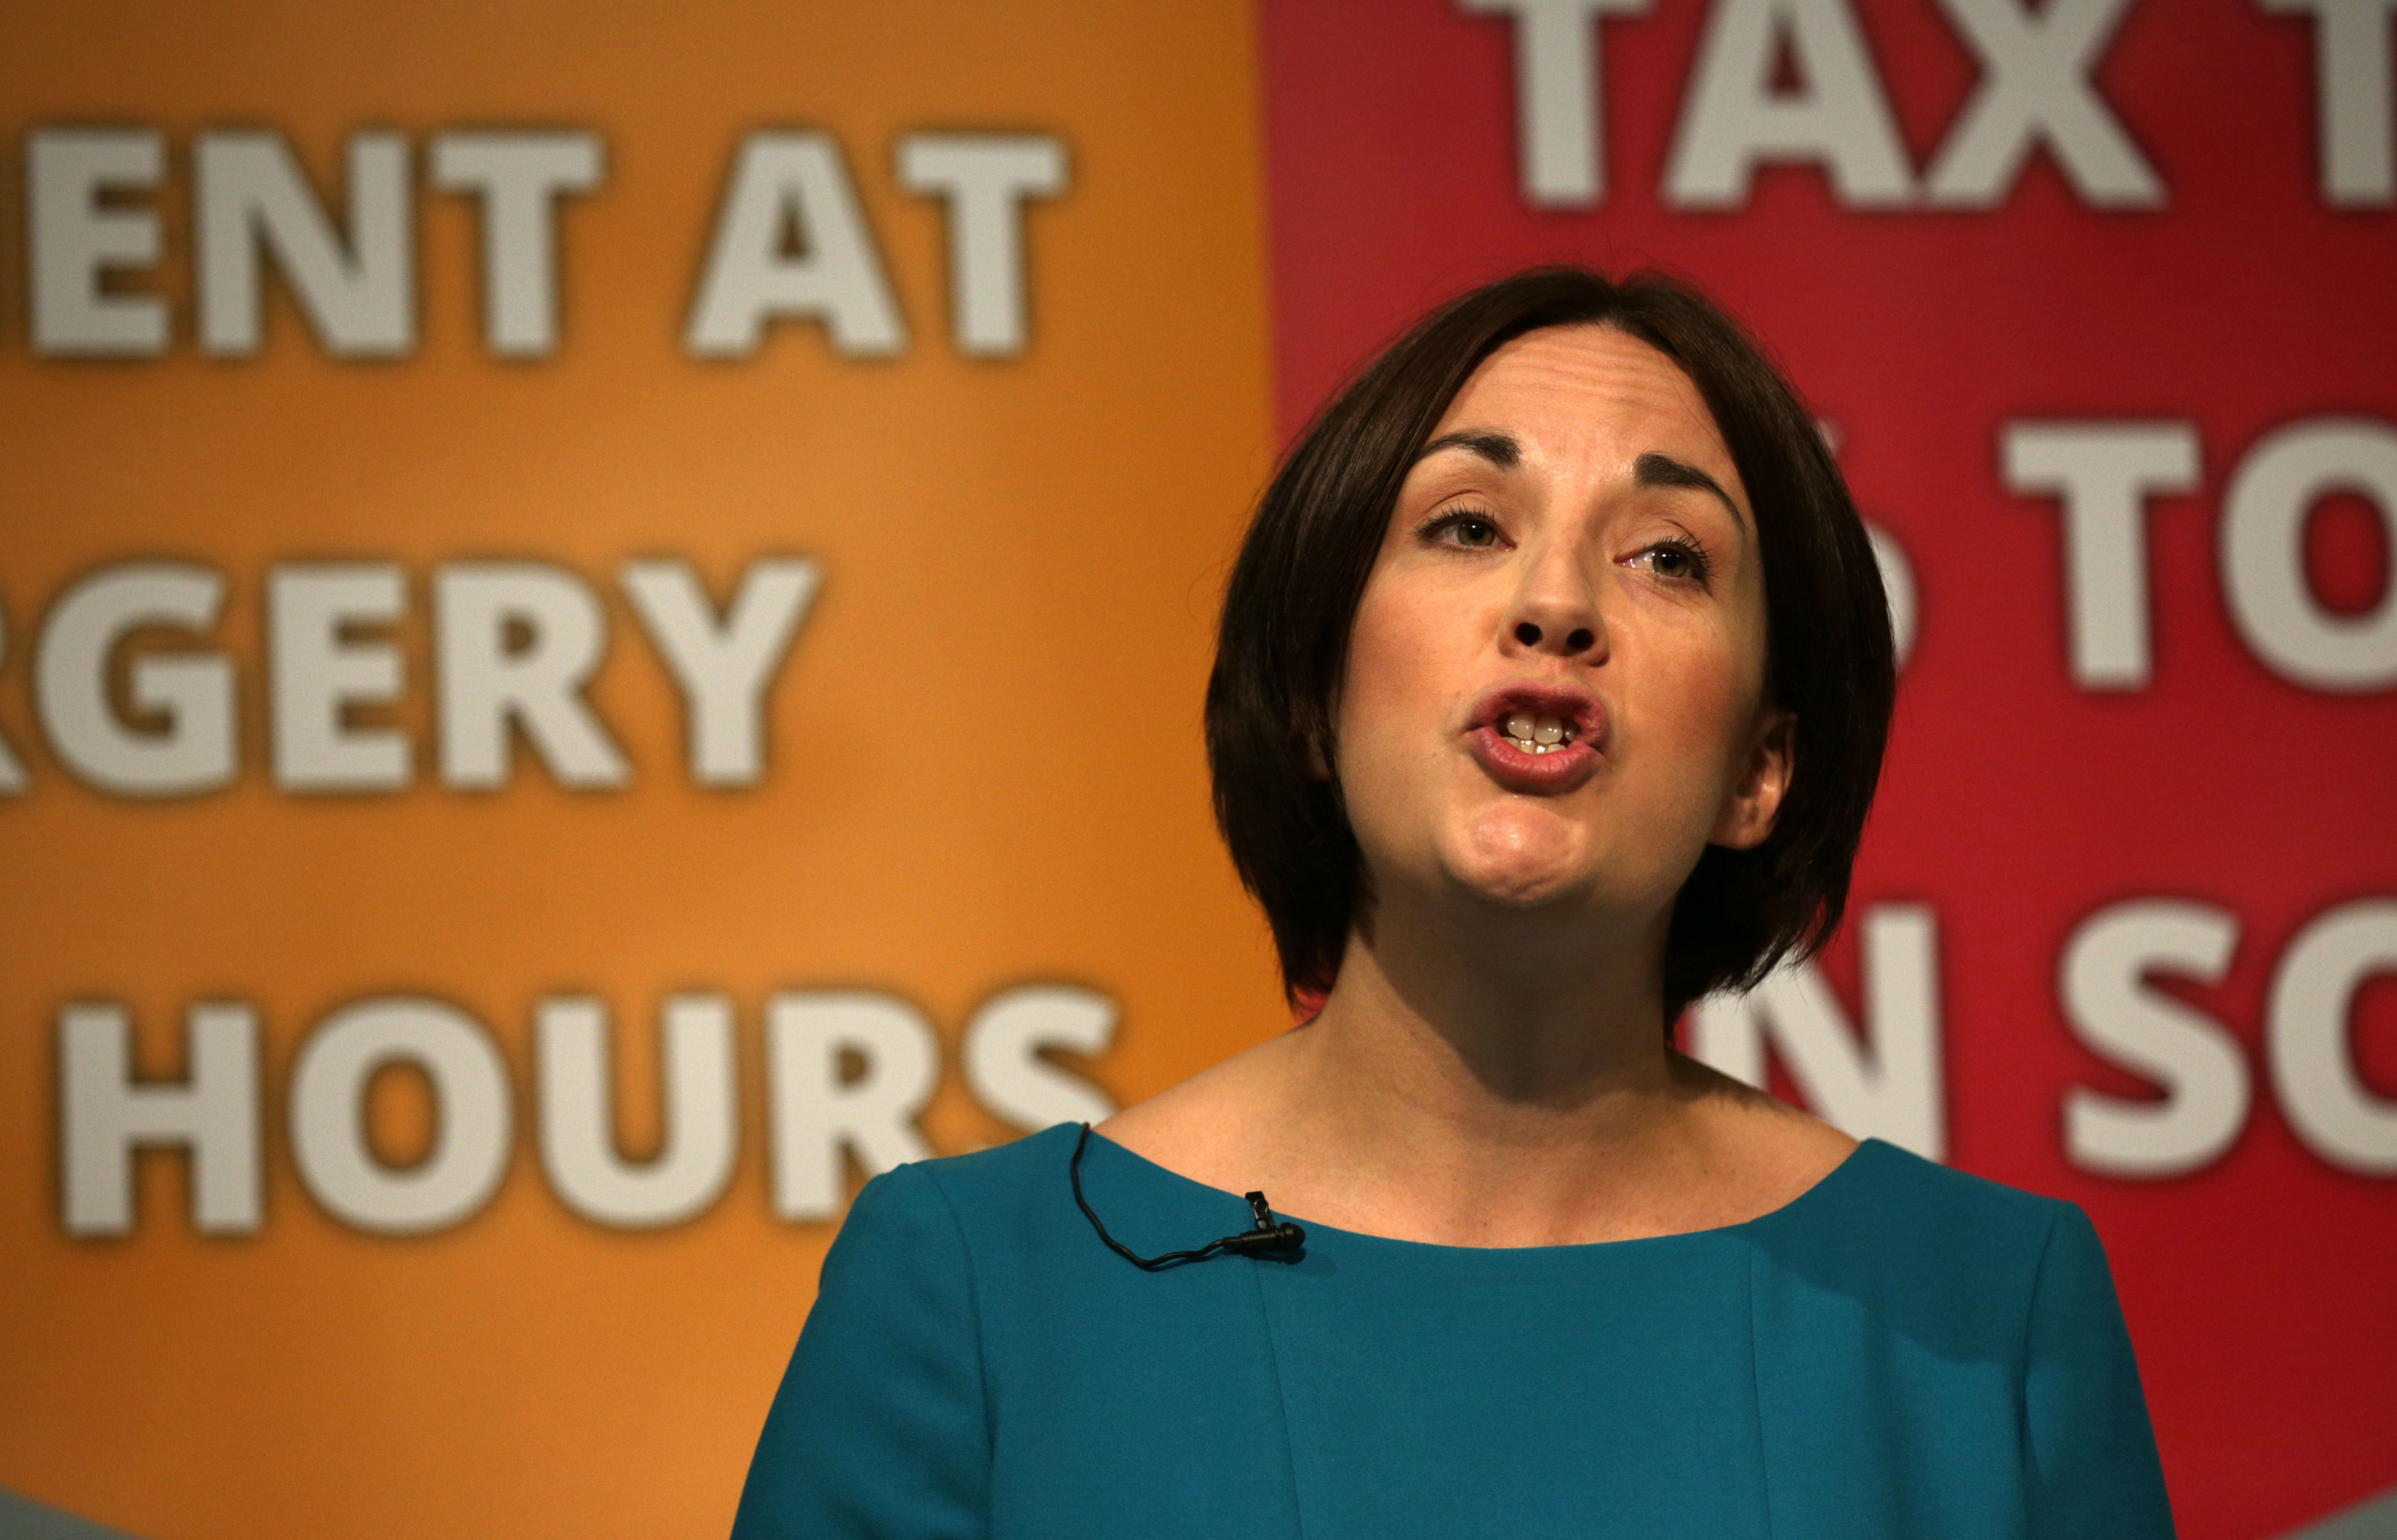 Scottish Labour leader Kezia Dugdale launches her party's manifesto.